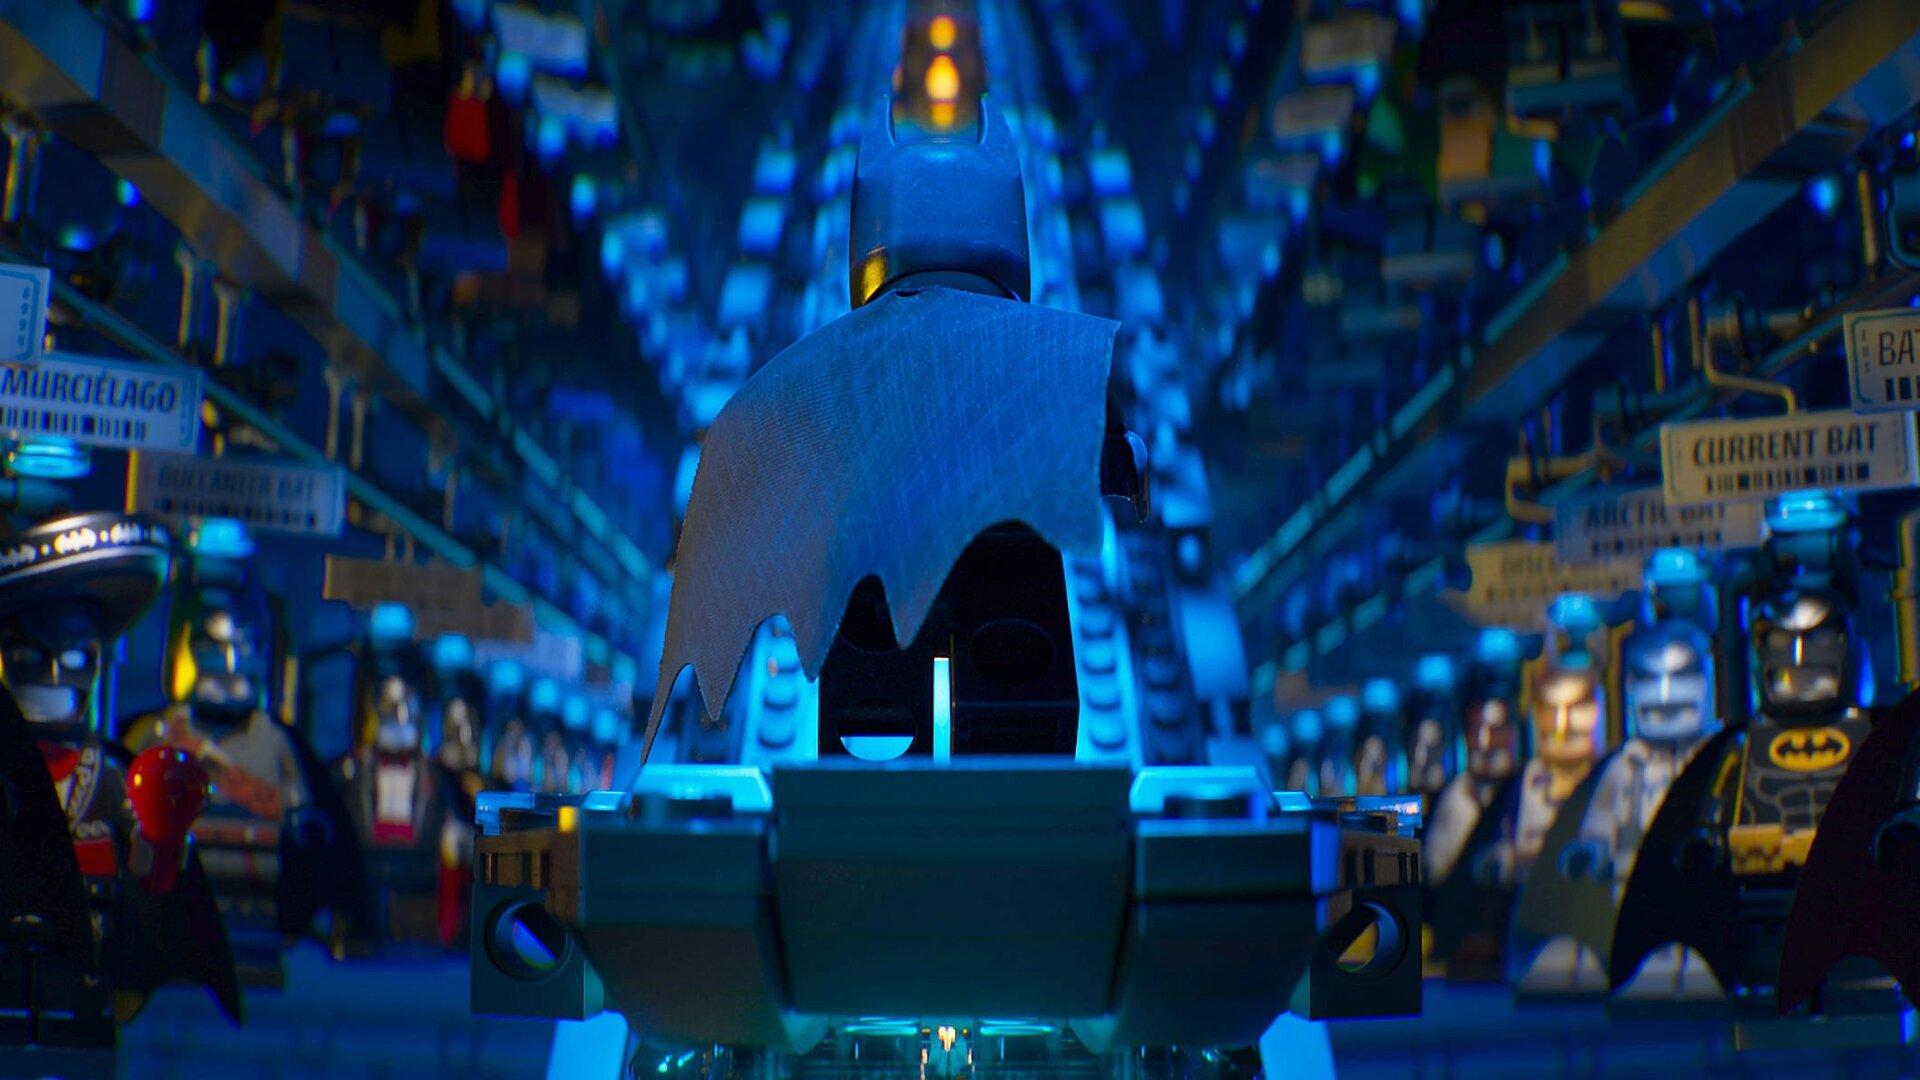 1920x1080 The Lego Batman Movie HD Laptop Full HD 1080P HD ...